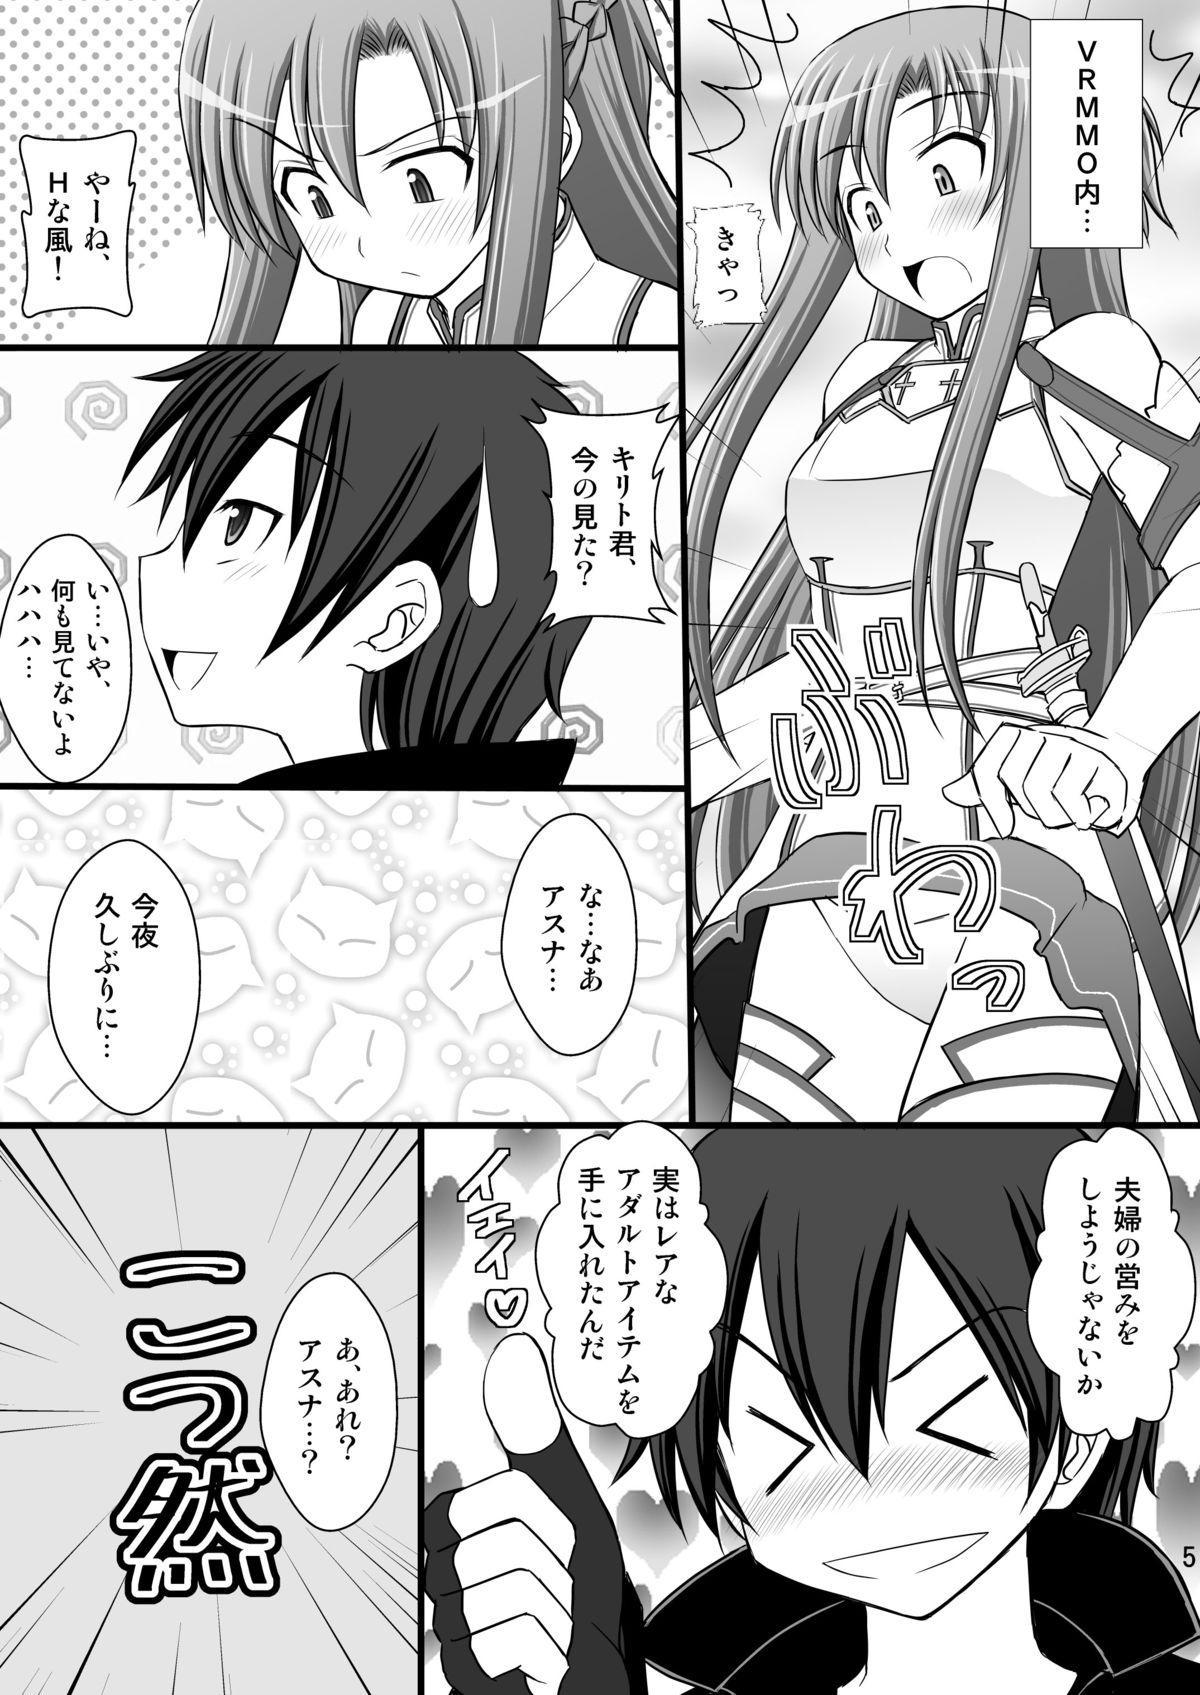 Toraware Hime I - System Master Nyaa Sakarae nee 3